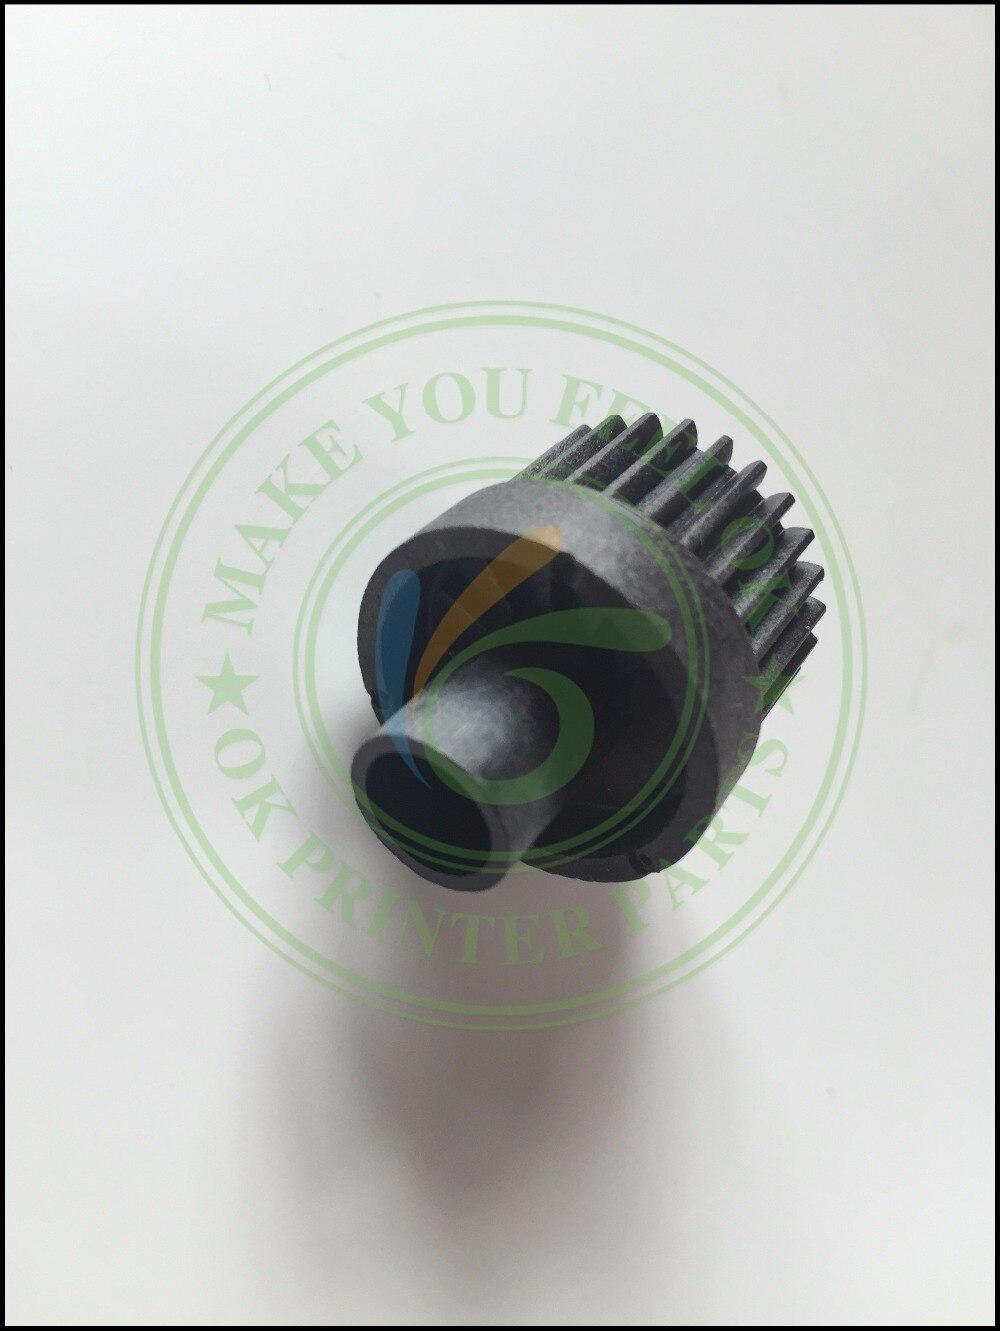 ORIGINAL NEW JC66-01202A Fuser Inner Drive Gear for Samsung ML1915 ML2525 ML2580 ML2540 ML2545 SCX4200 SCX4300 SCX4600 SCX4623 3pieces lot free shipping toner cartridge chip for samsung mlt d1053s 1053l 1052 ml 1910 1911 1915 2525w 2526 2580 scx 4600